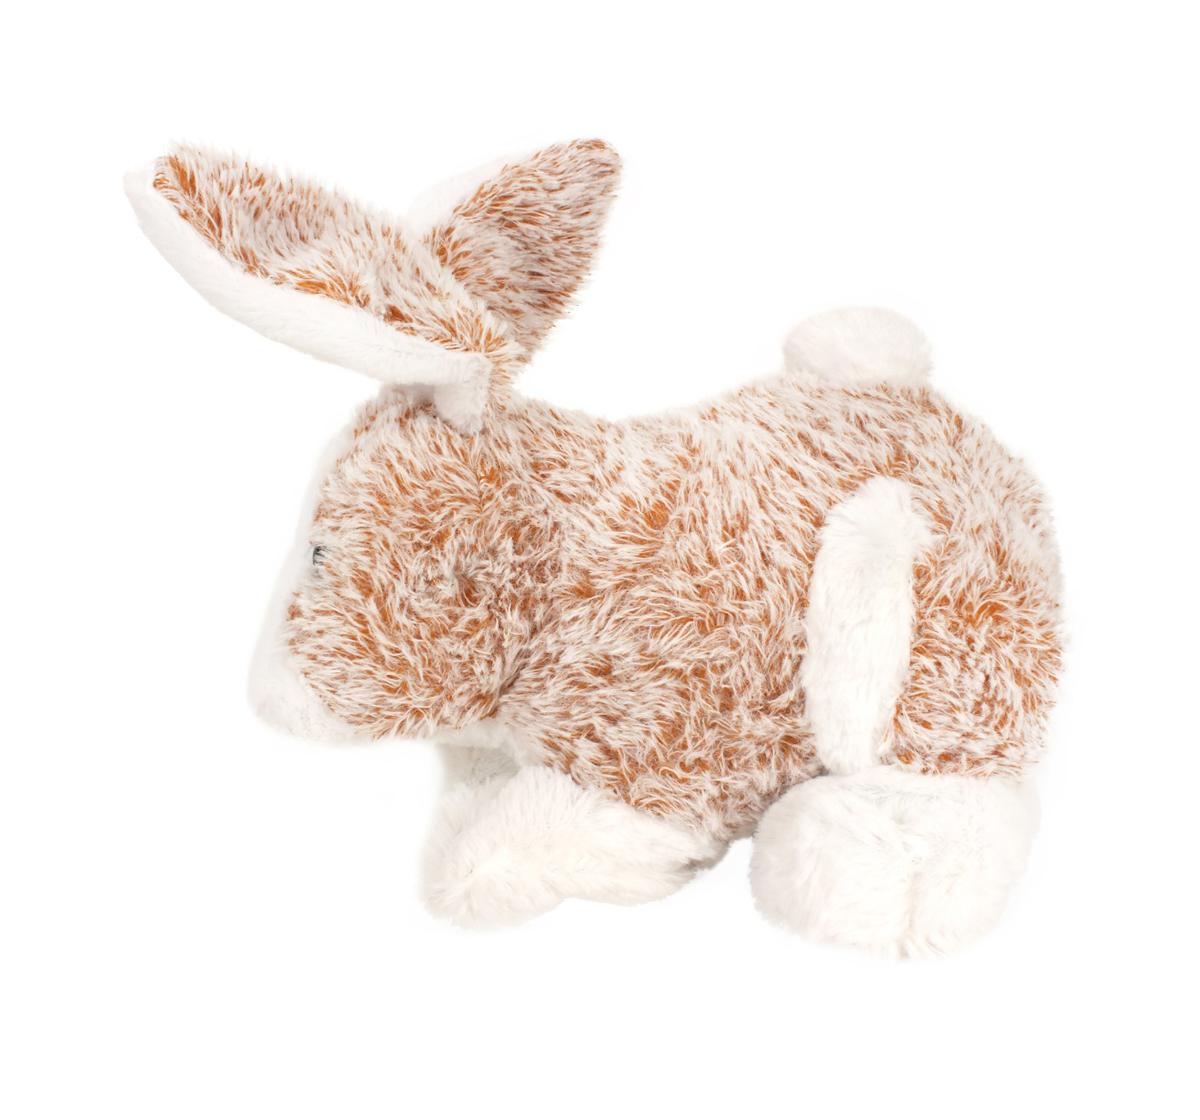 Fuzzbuzz | Fuzzbuzz Soft Furry Bunny - White - 25Cm Quirky Soft Toys for Kids age 0M+ - 18 Cm (White)